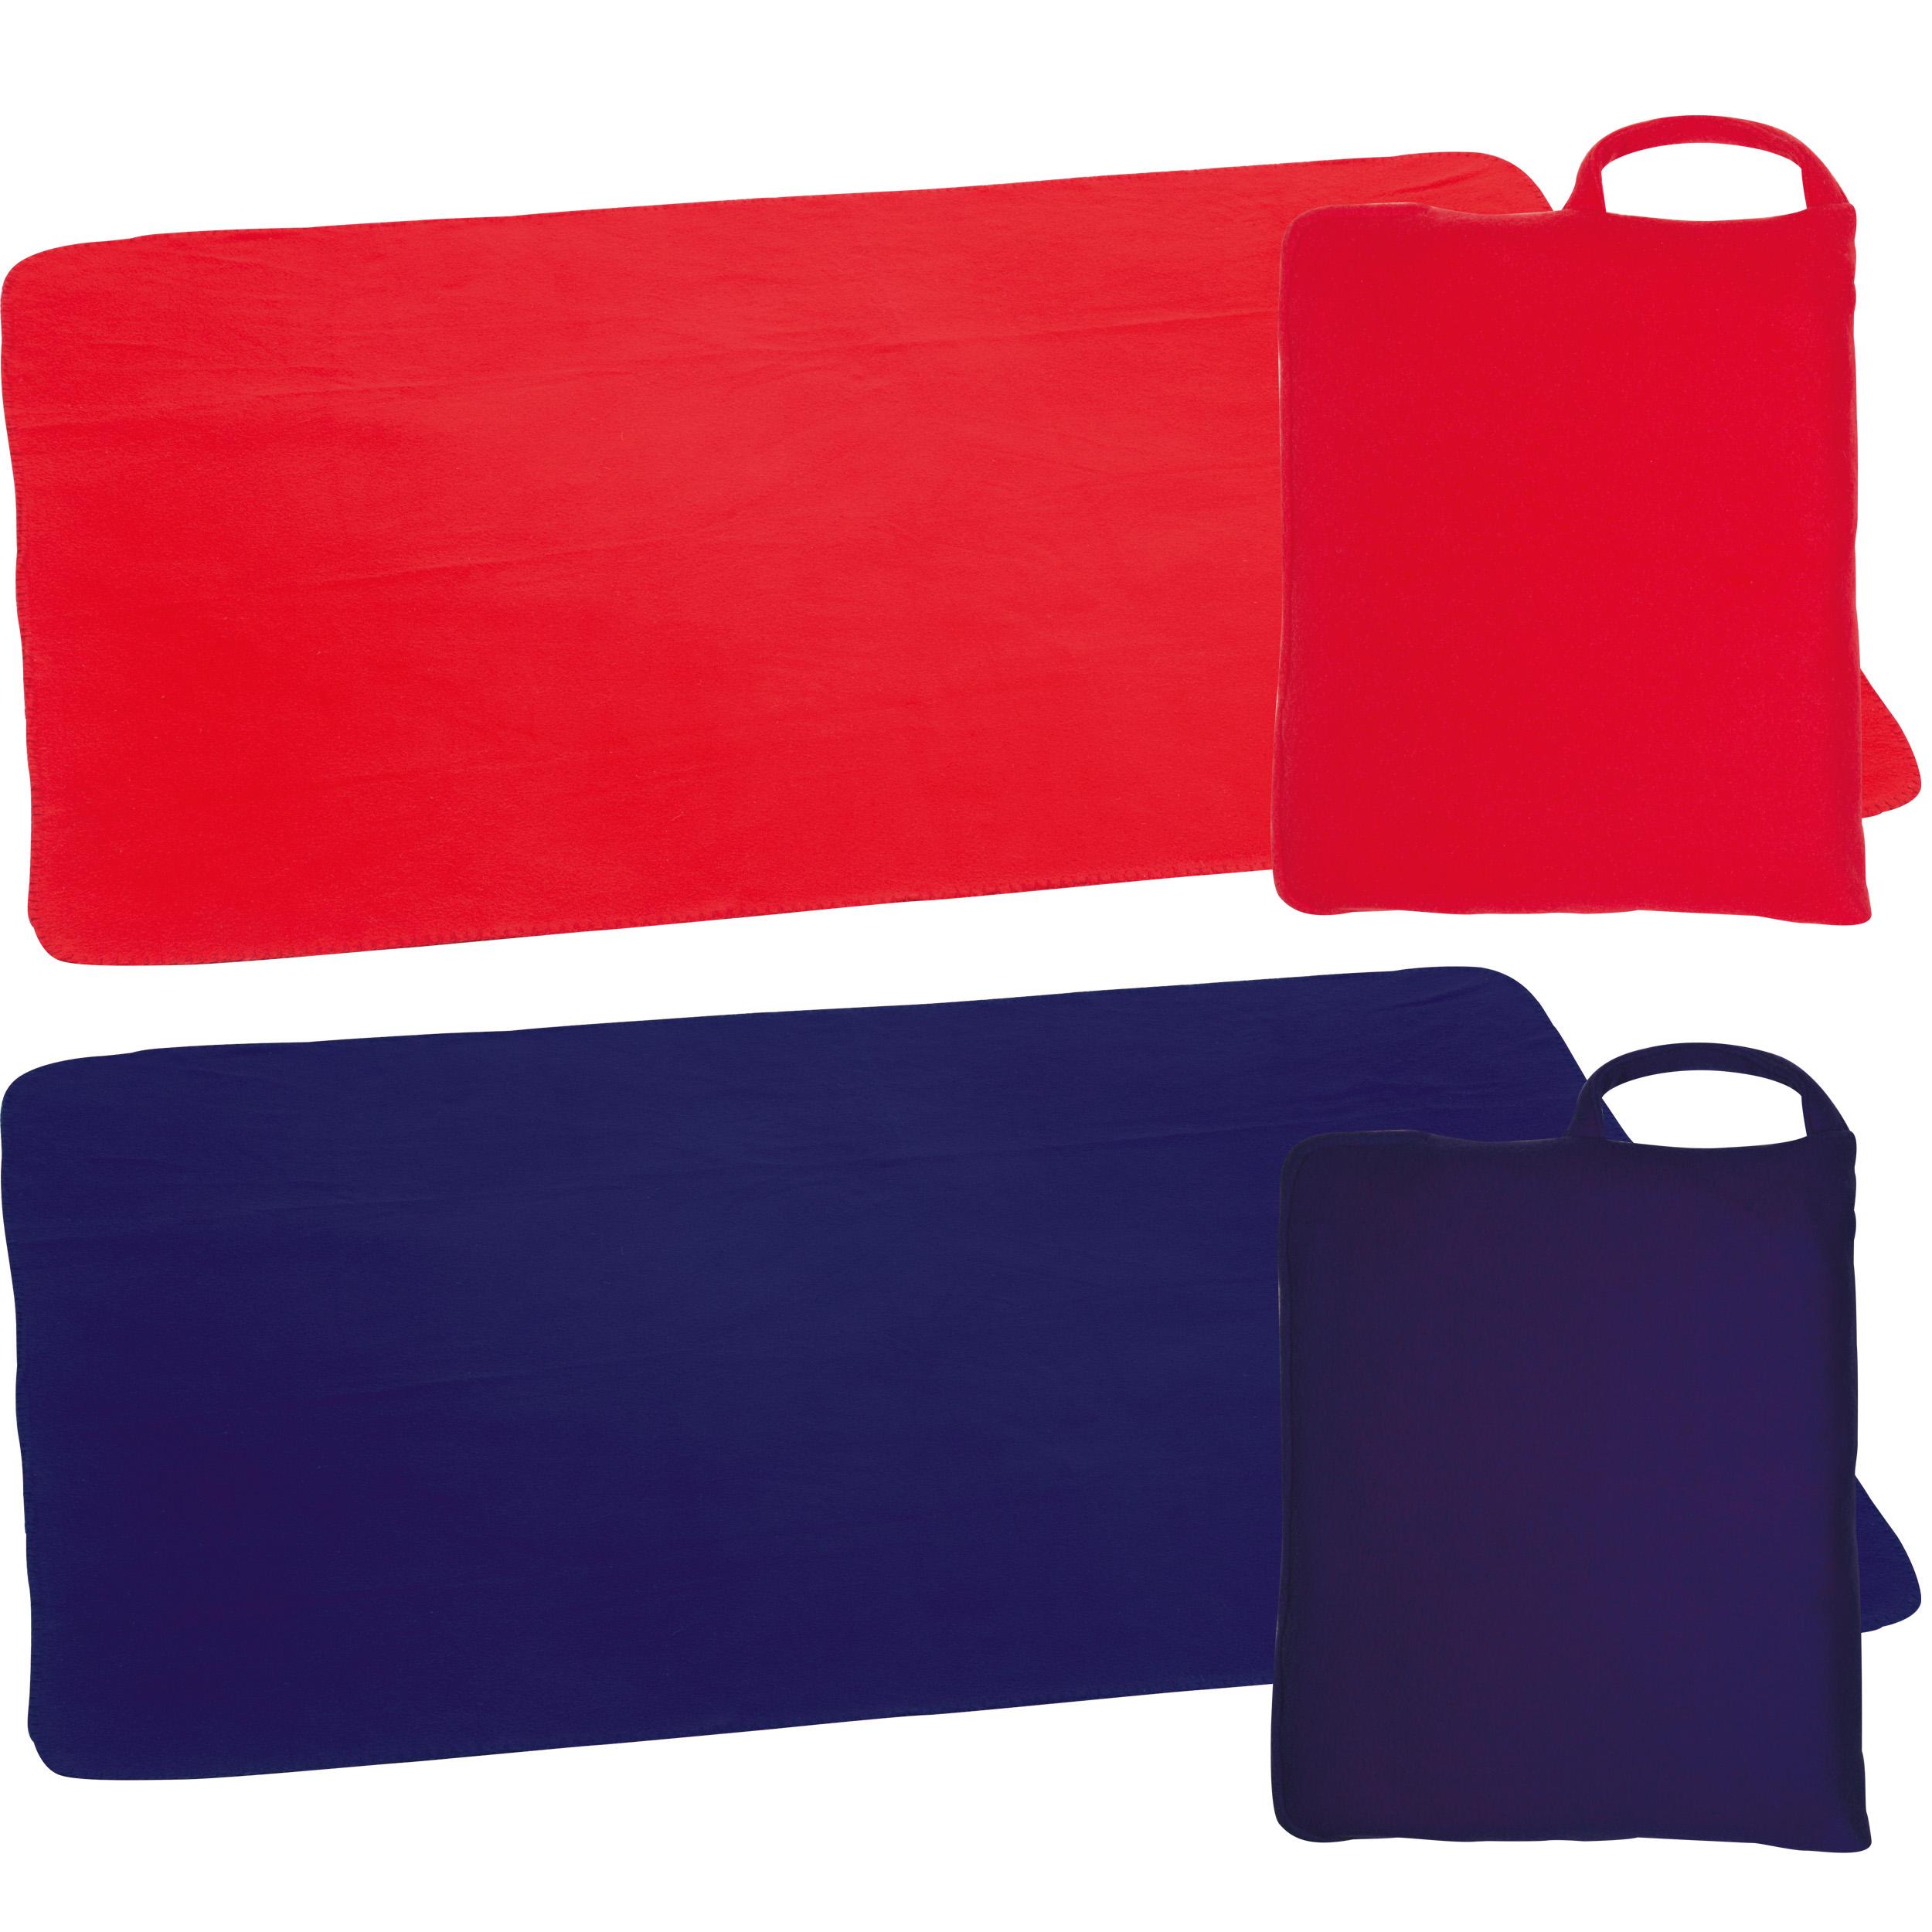 Fleecebag (pillow) with blanket